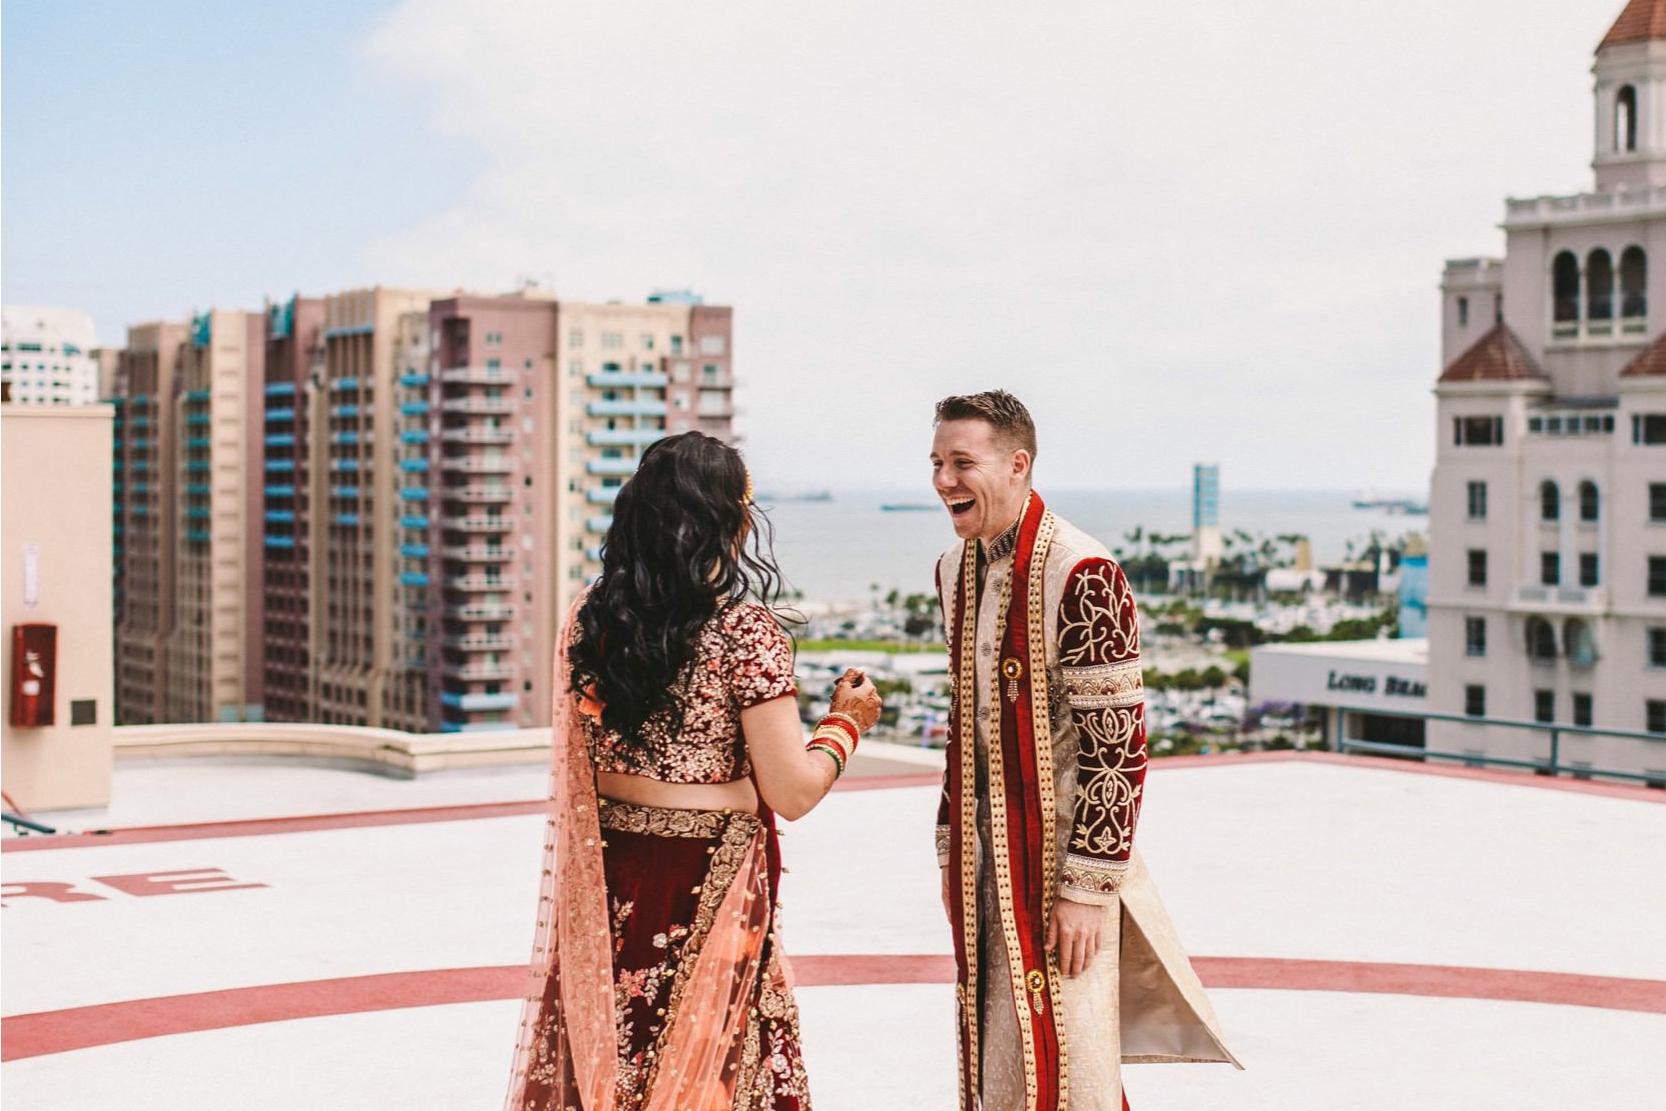 Orange County & Long Beach Wedding Photography Blog - Indian Fusion Wedding 301b.jpg